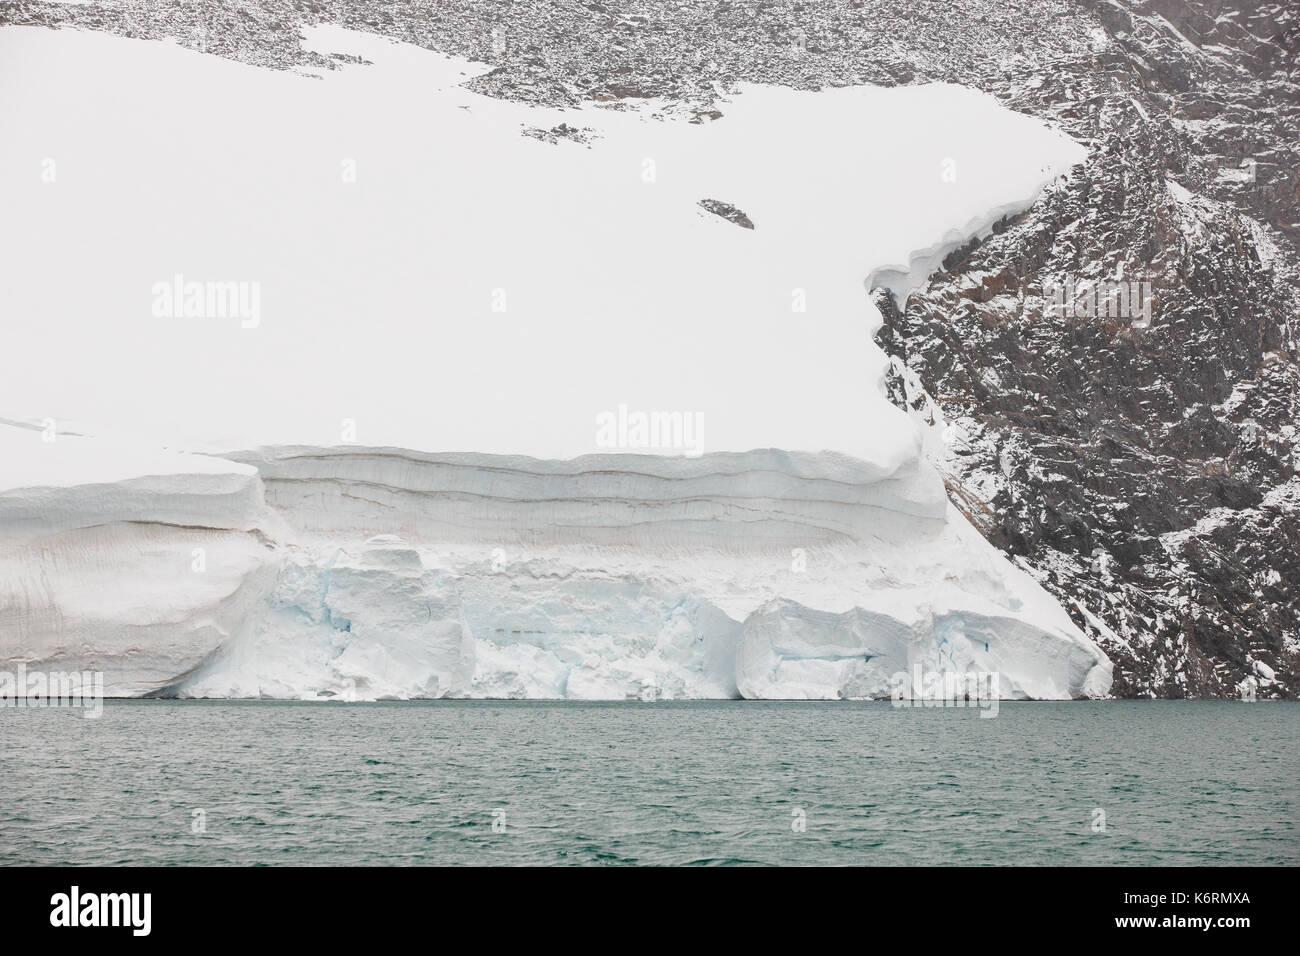 Galdhopiggen glacier. Jotunheimen national park. Route 55. Norwegian winter landscape - Stock Image